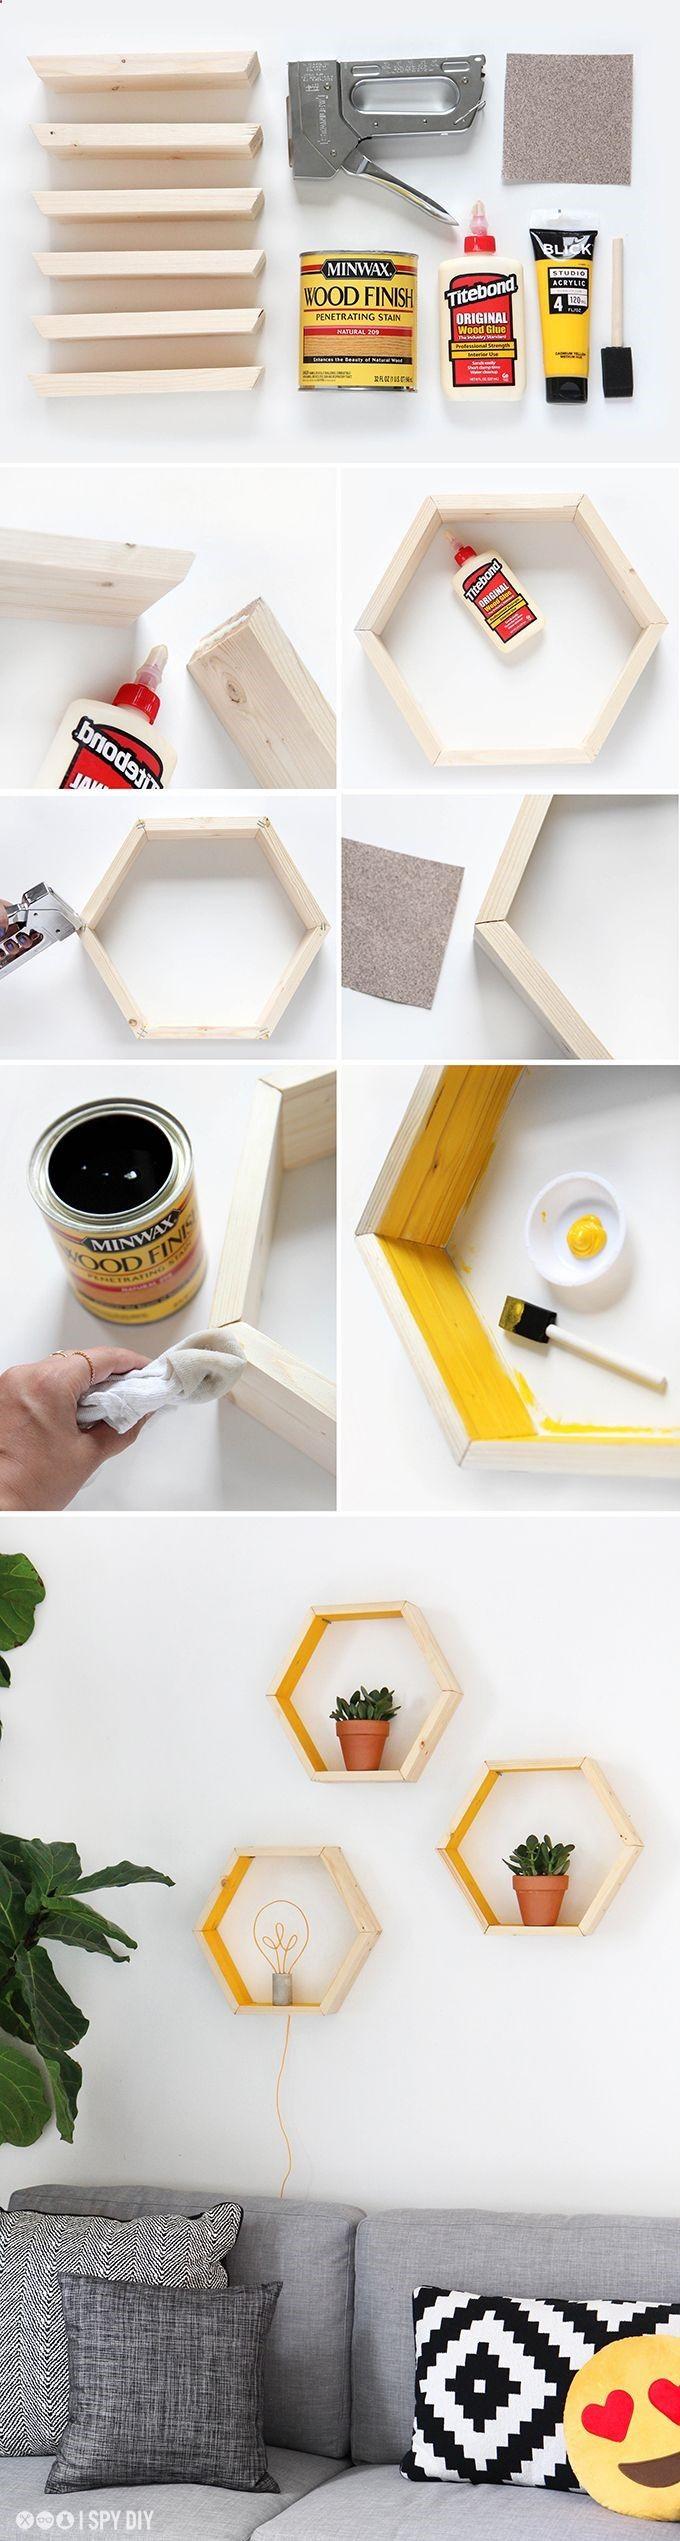 Teds Wood Working - Inspiring DIY Projects  Tutorials: MY DIY | Hexagon Shape Shelves - Get A Lifetime Of Project Ideas & Inspiration!